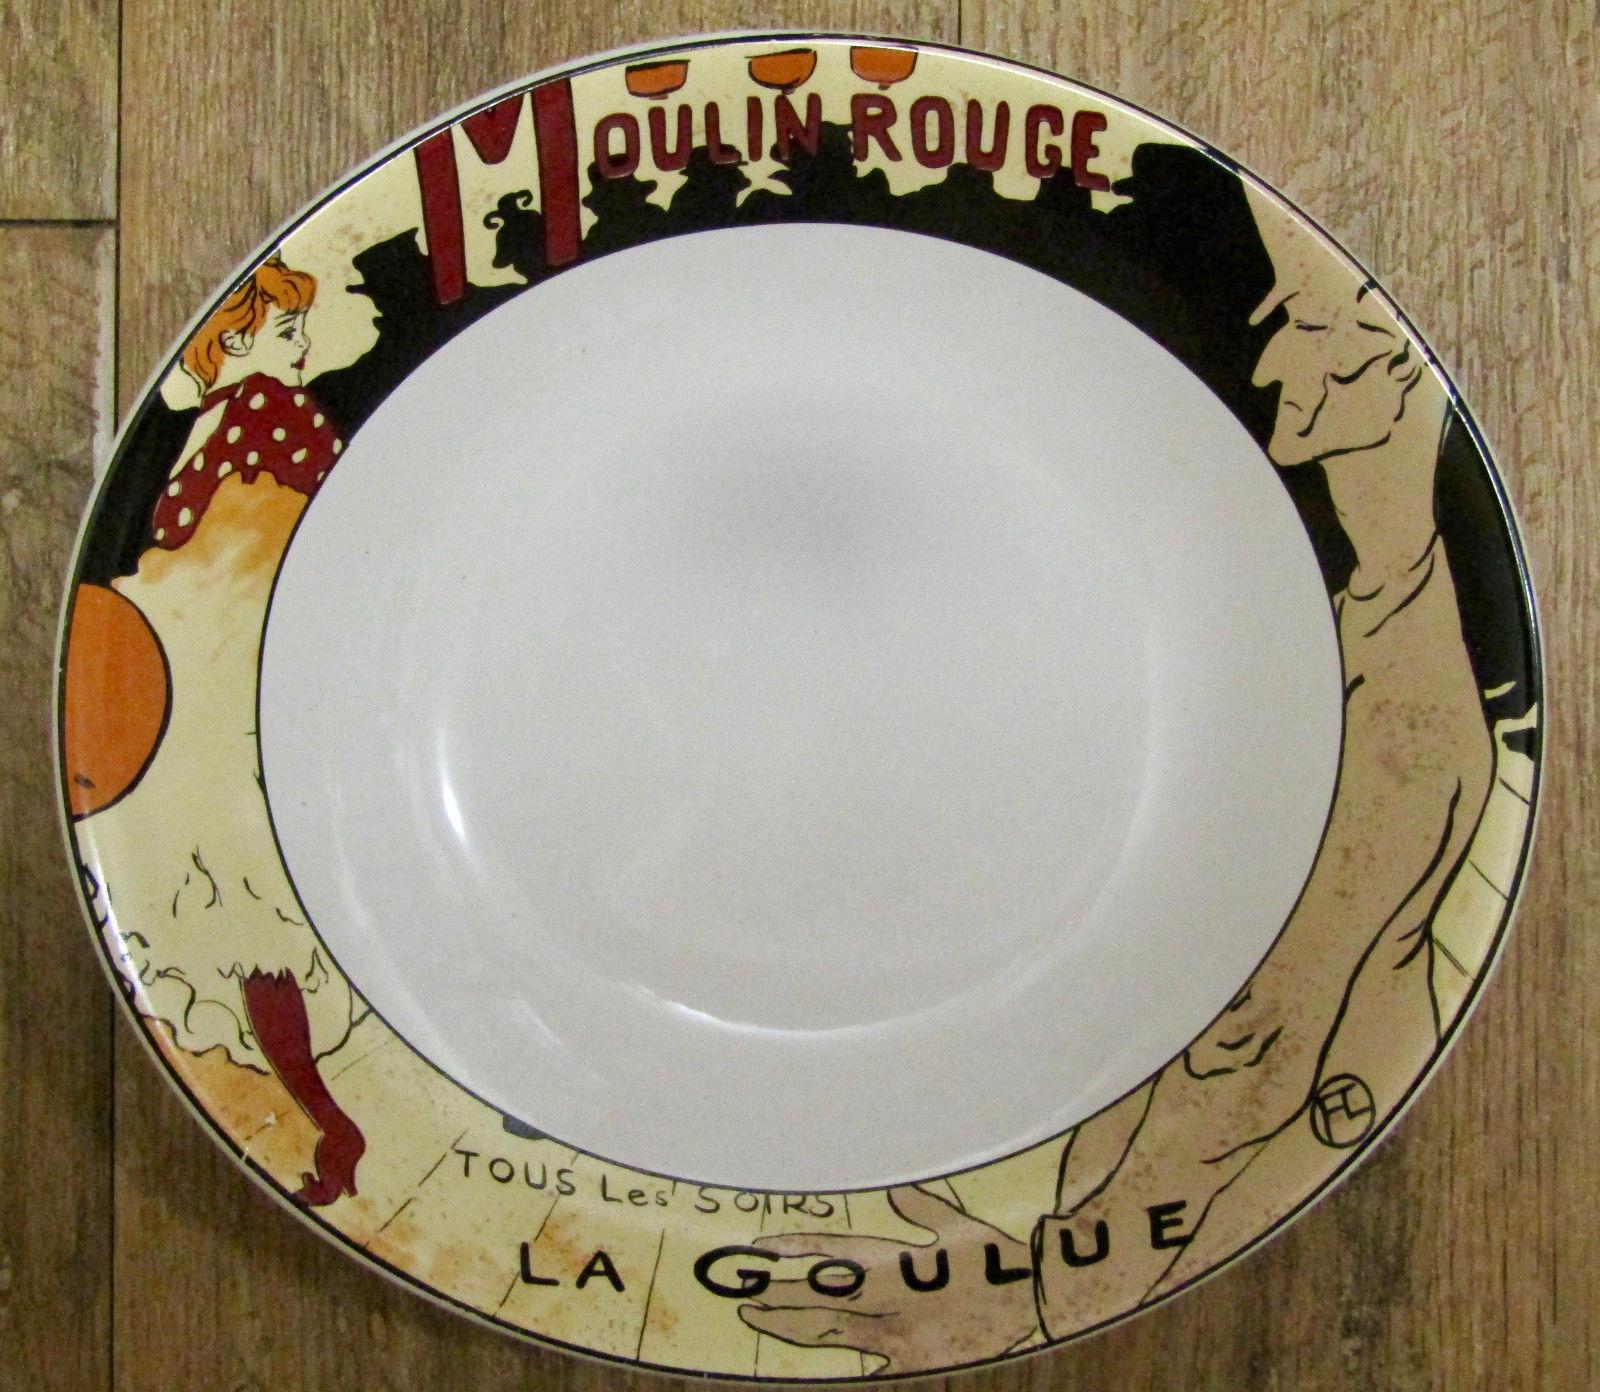 Vintage Dinnerware Vintage Sango Plates Serveware Sango Jane Avril Saucer Cabaret 95 4870 set of 4